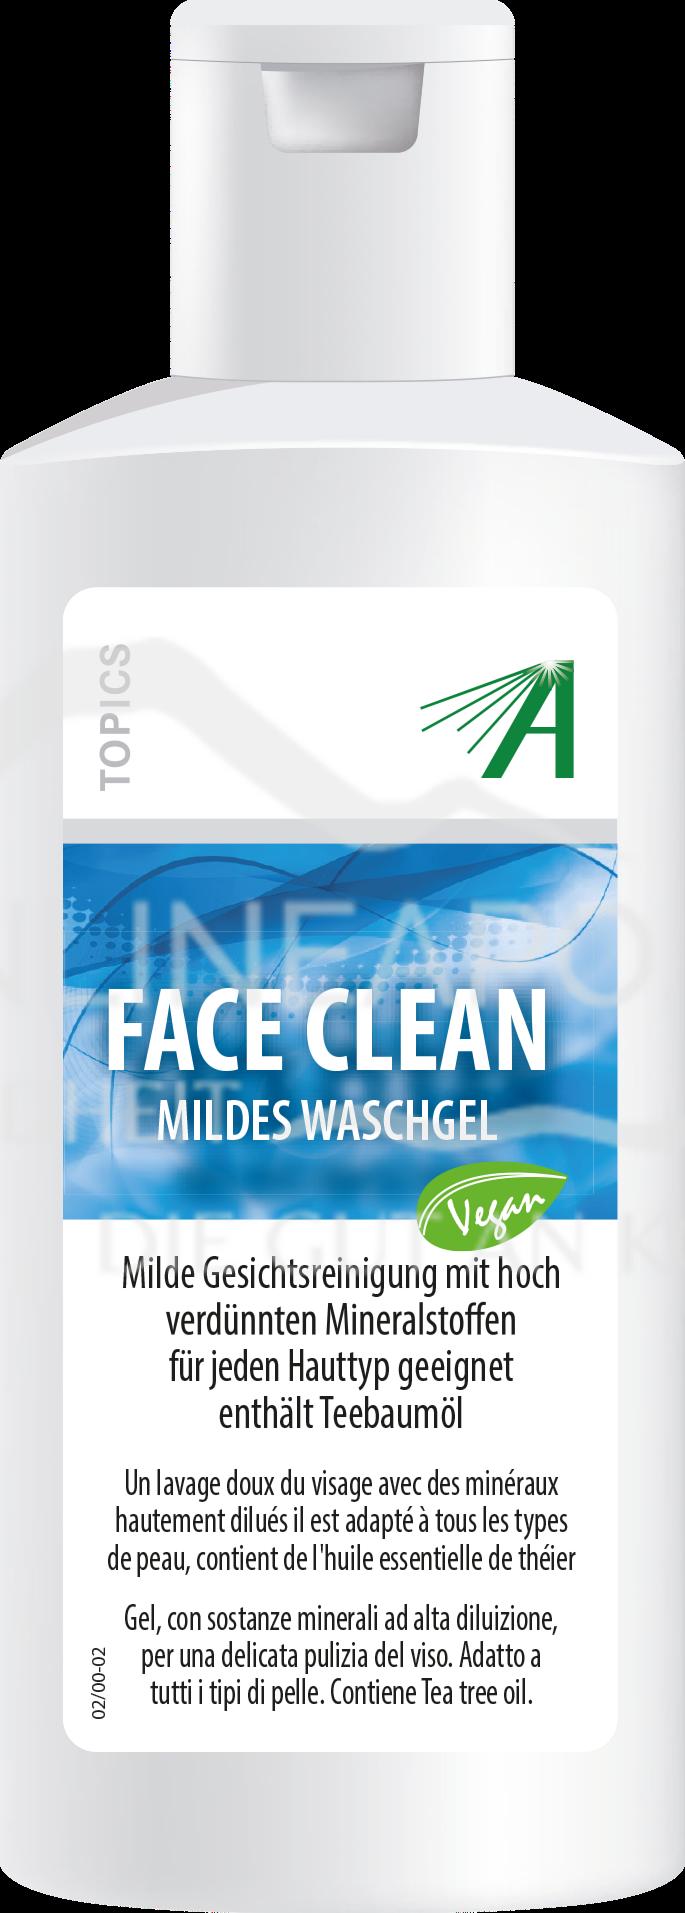 Adler Face Clean